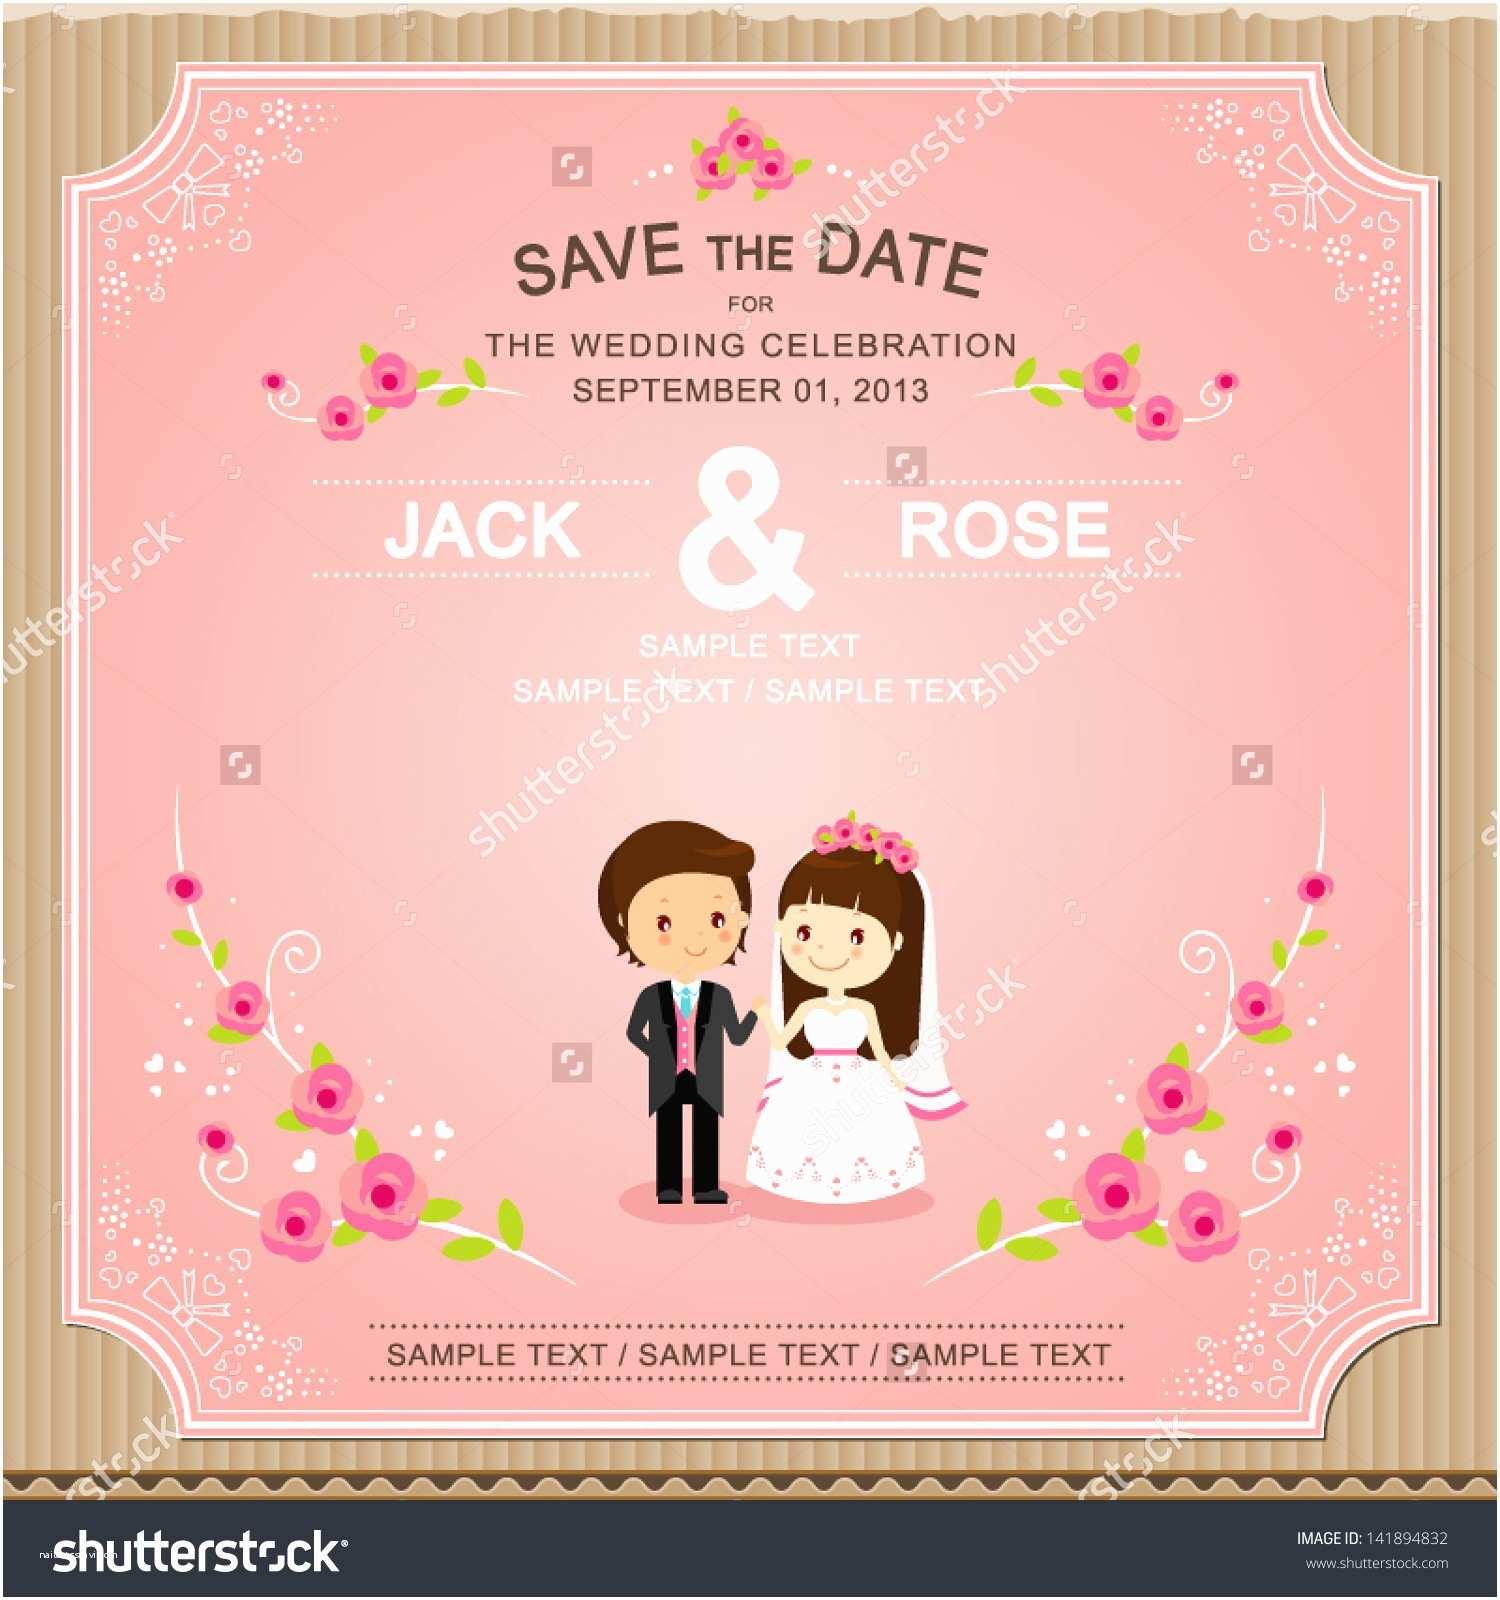 Wedding Invitation Designs Free Download Unique Wedding Invitation Card Design Template Free